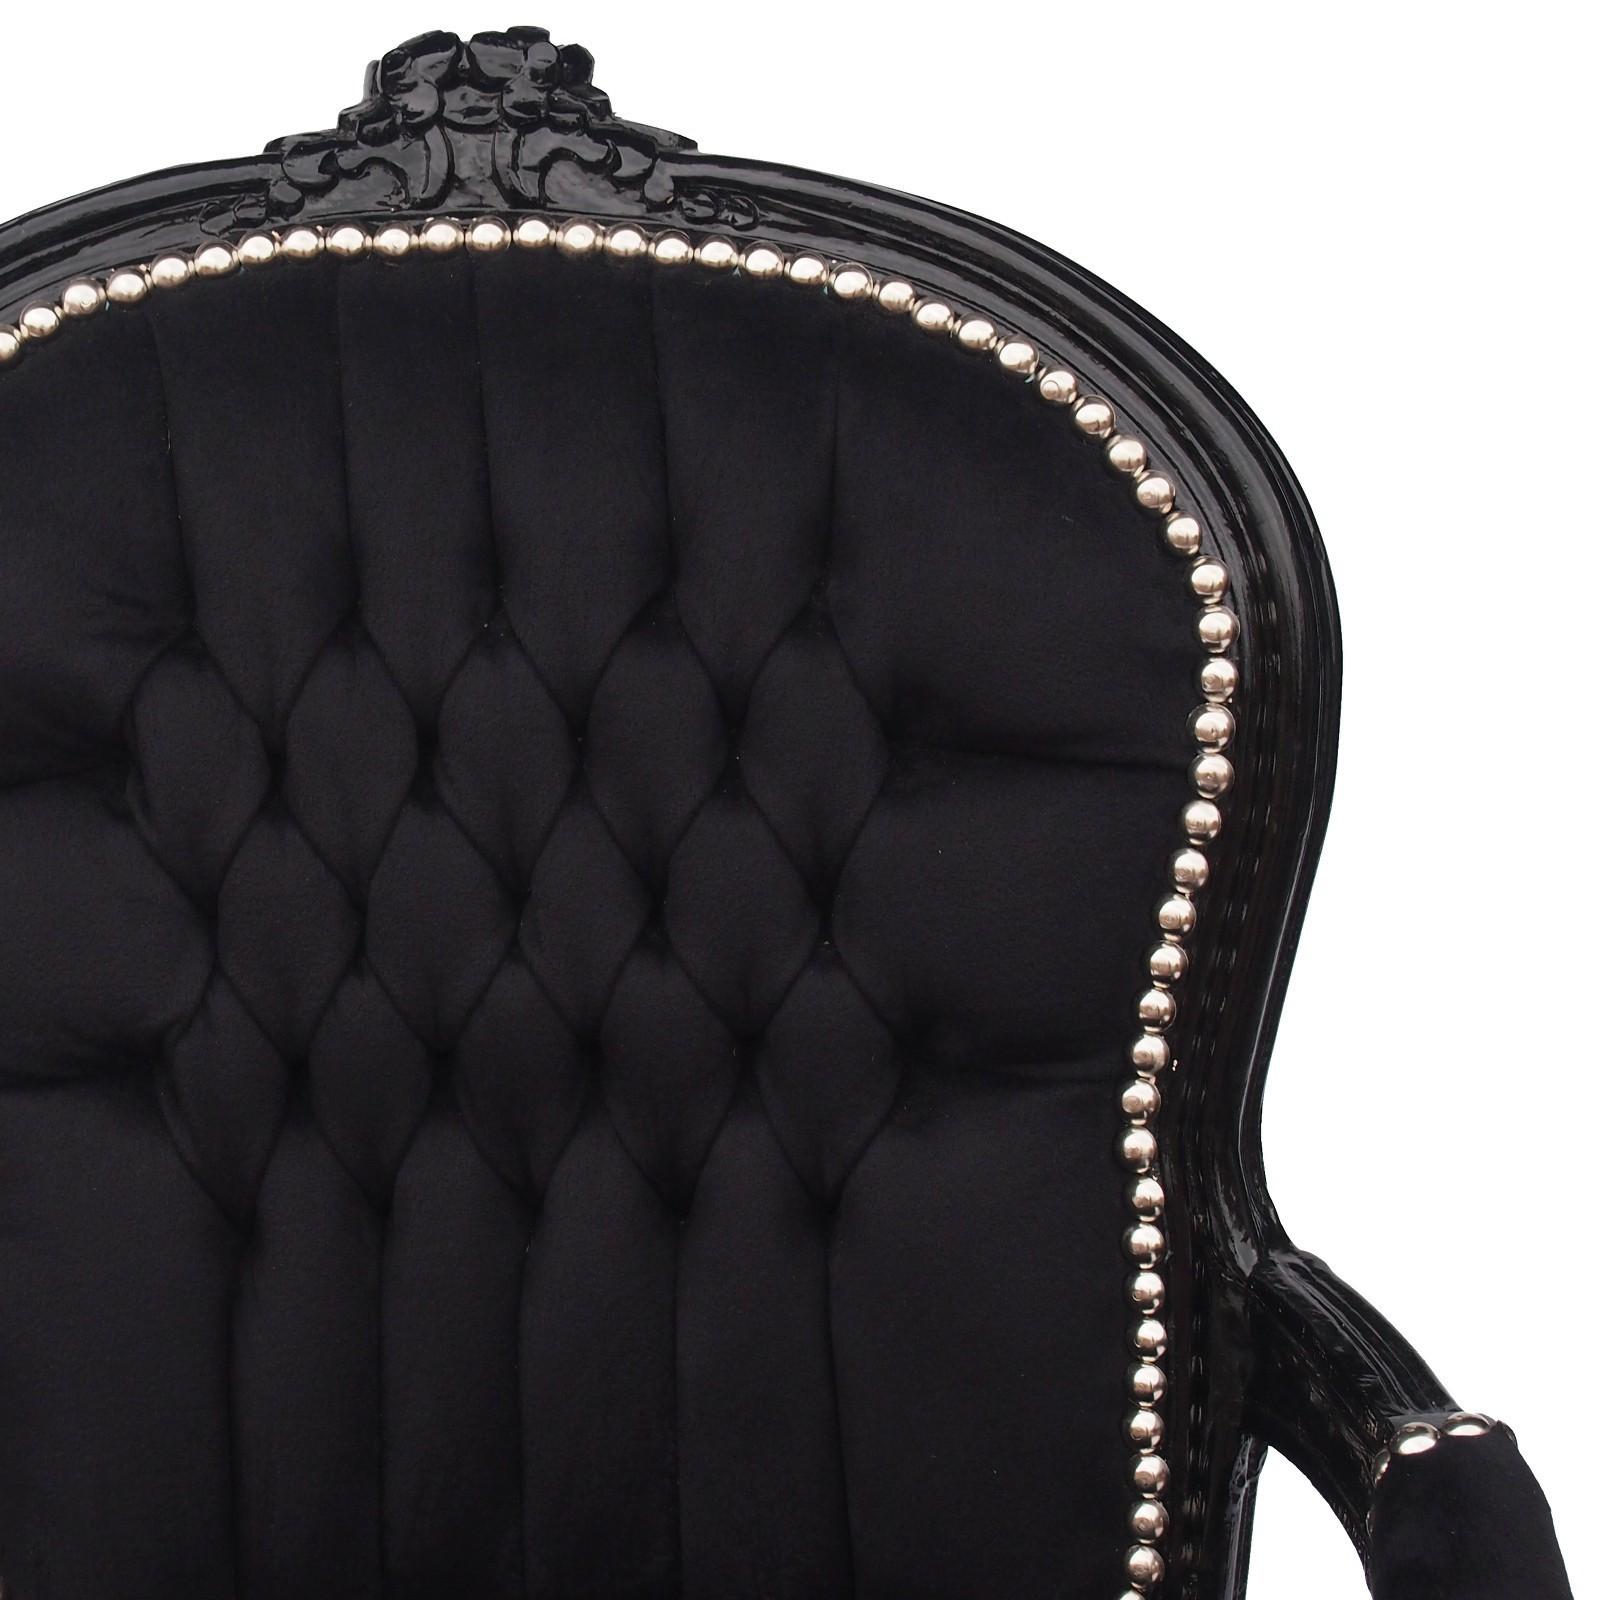 inneneinrichtung barock stuhl sessel antik m bel schwarz gothic gothik ebay. Black Bedroom Furniture Sets. Home Design Ideas